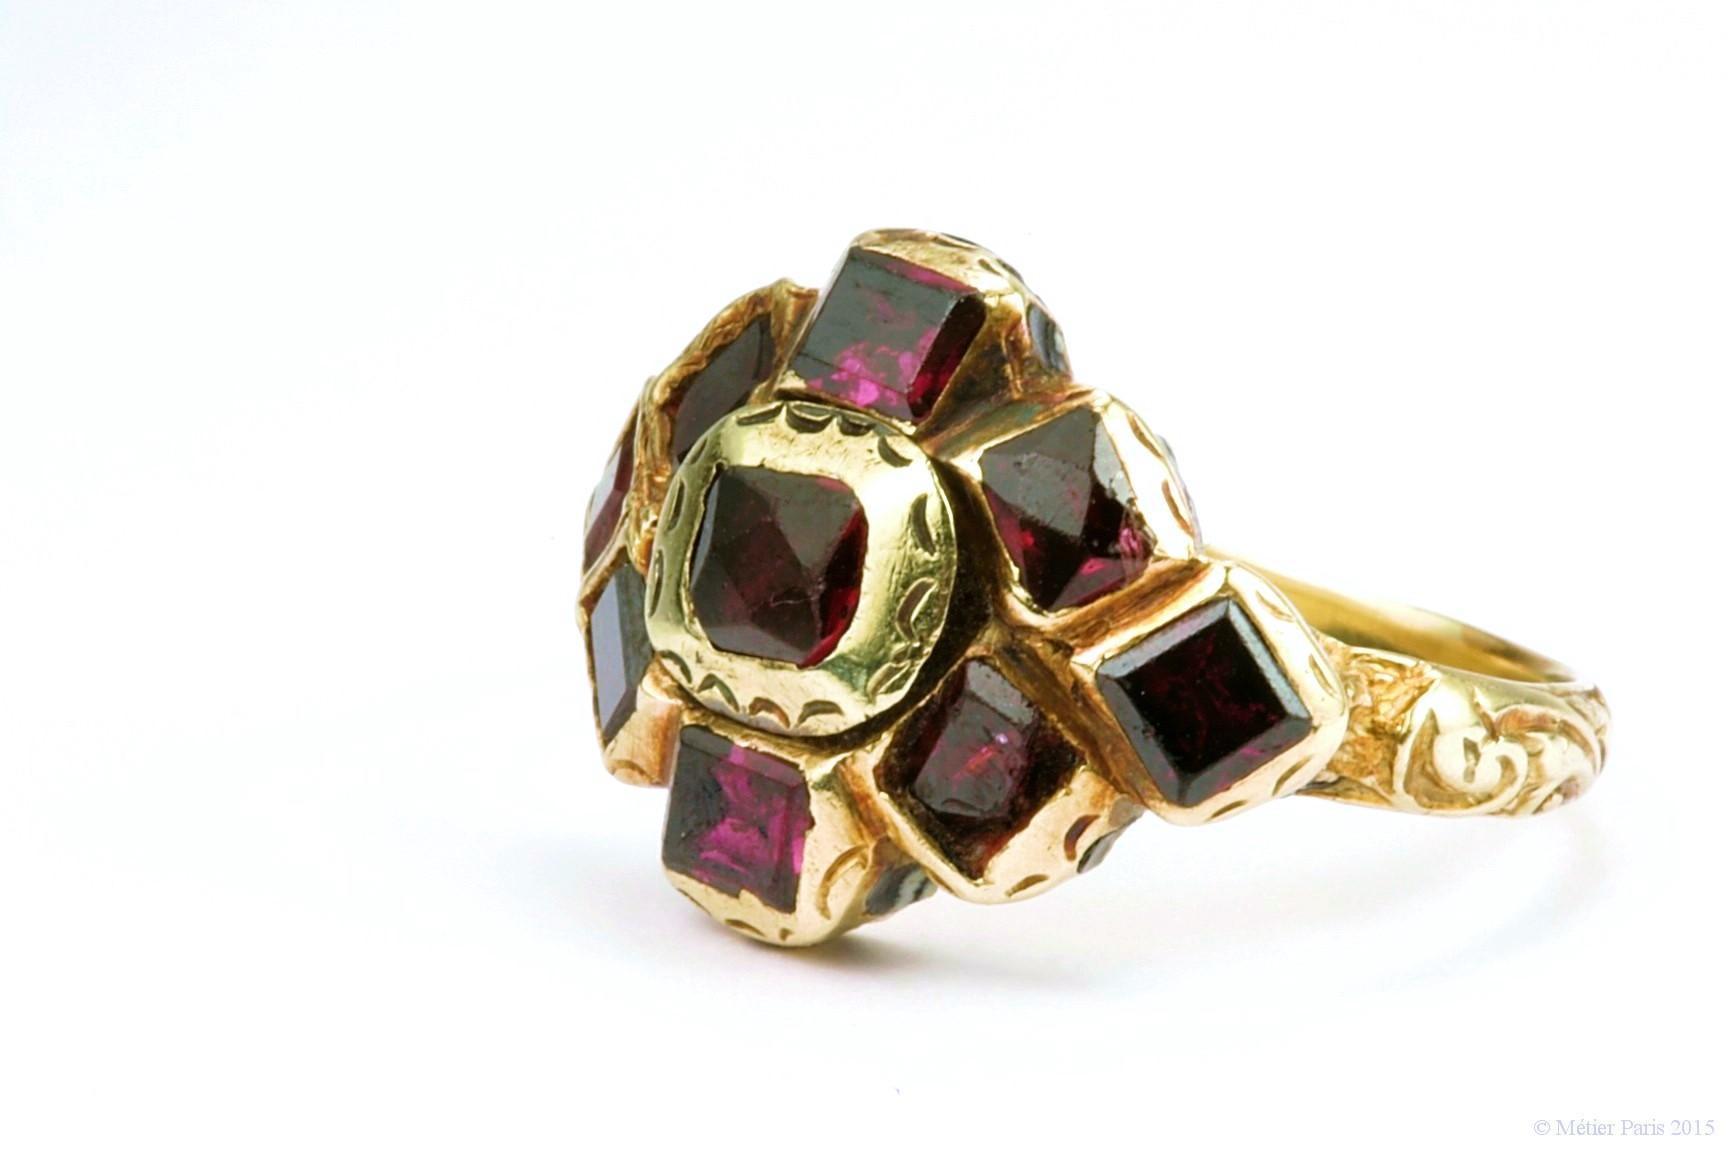 A 17th Century Garnet Ring, Spanish c. 1680